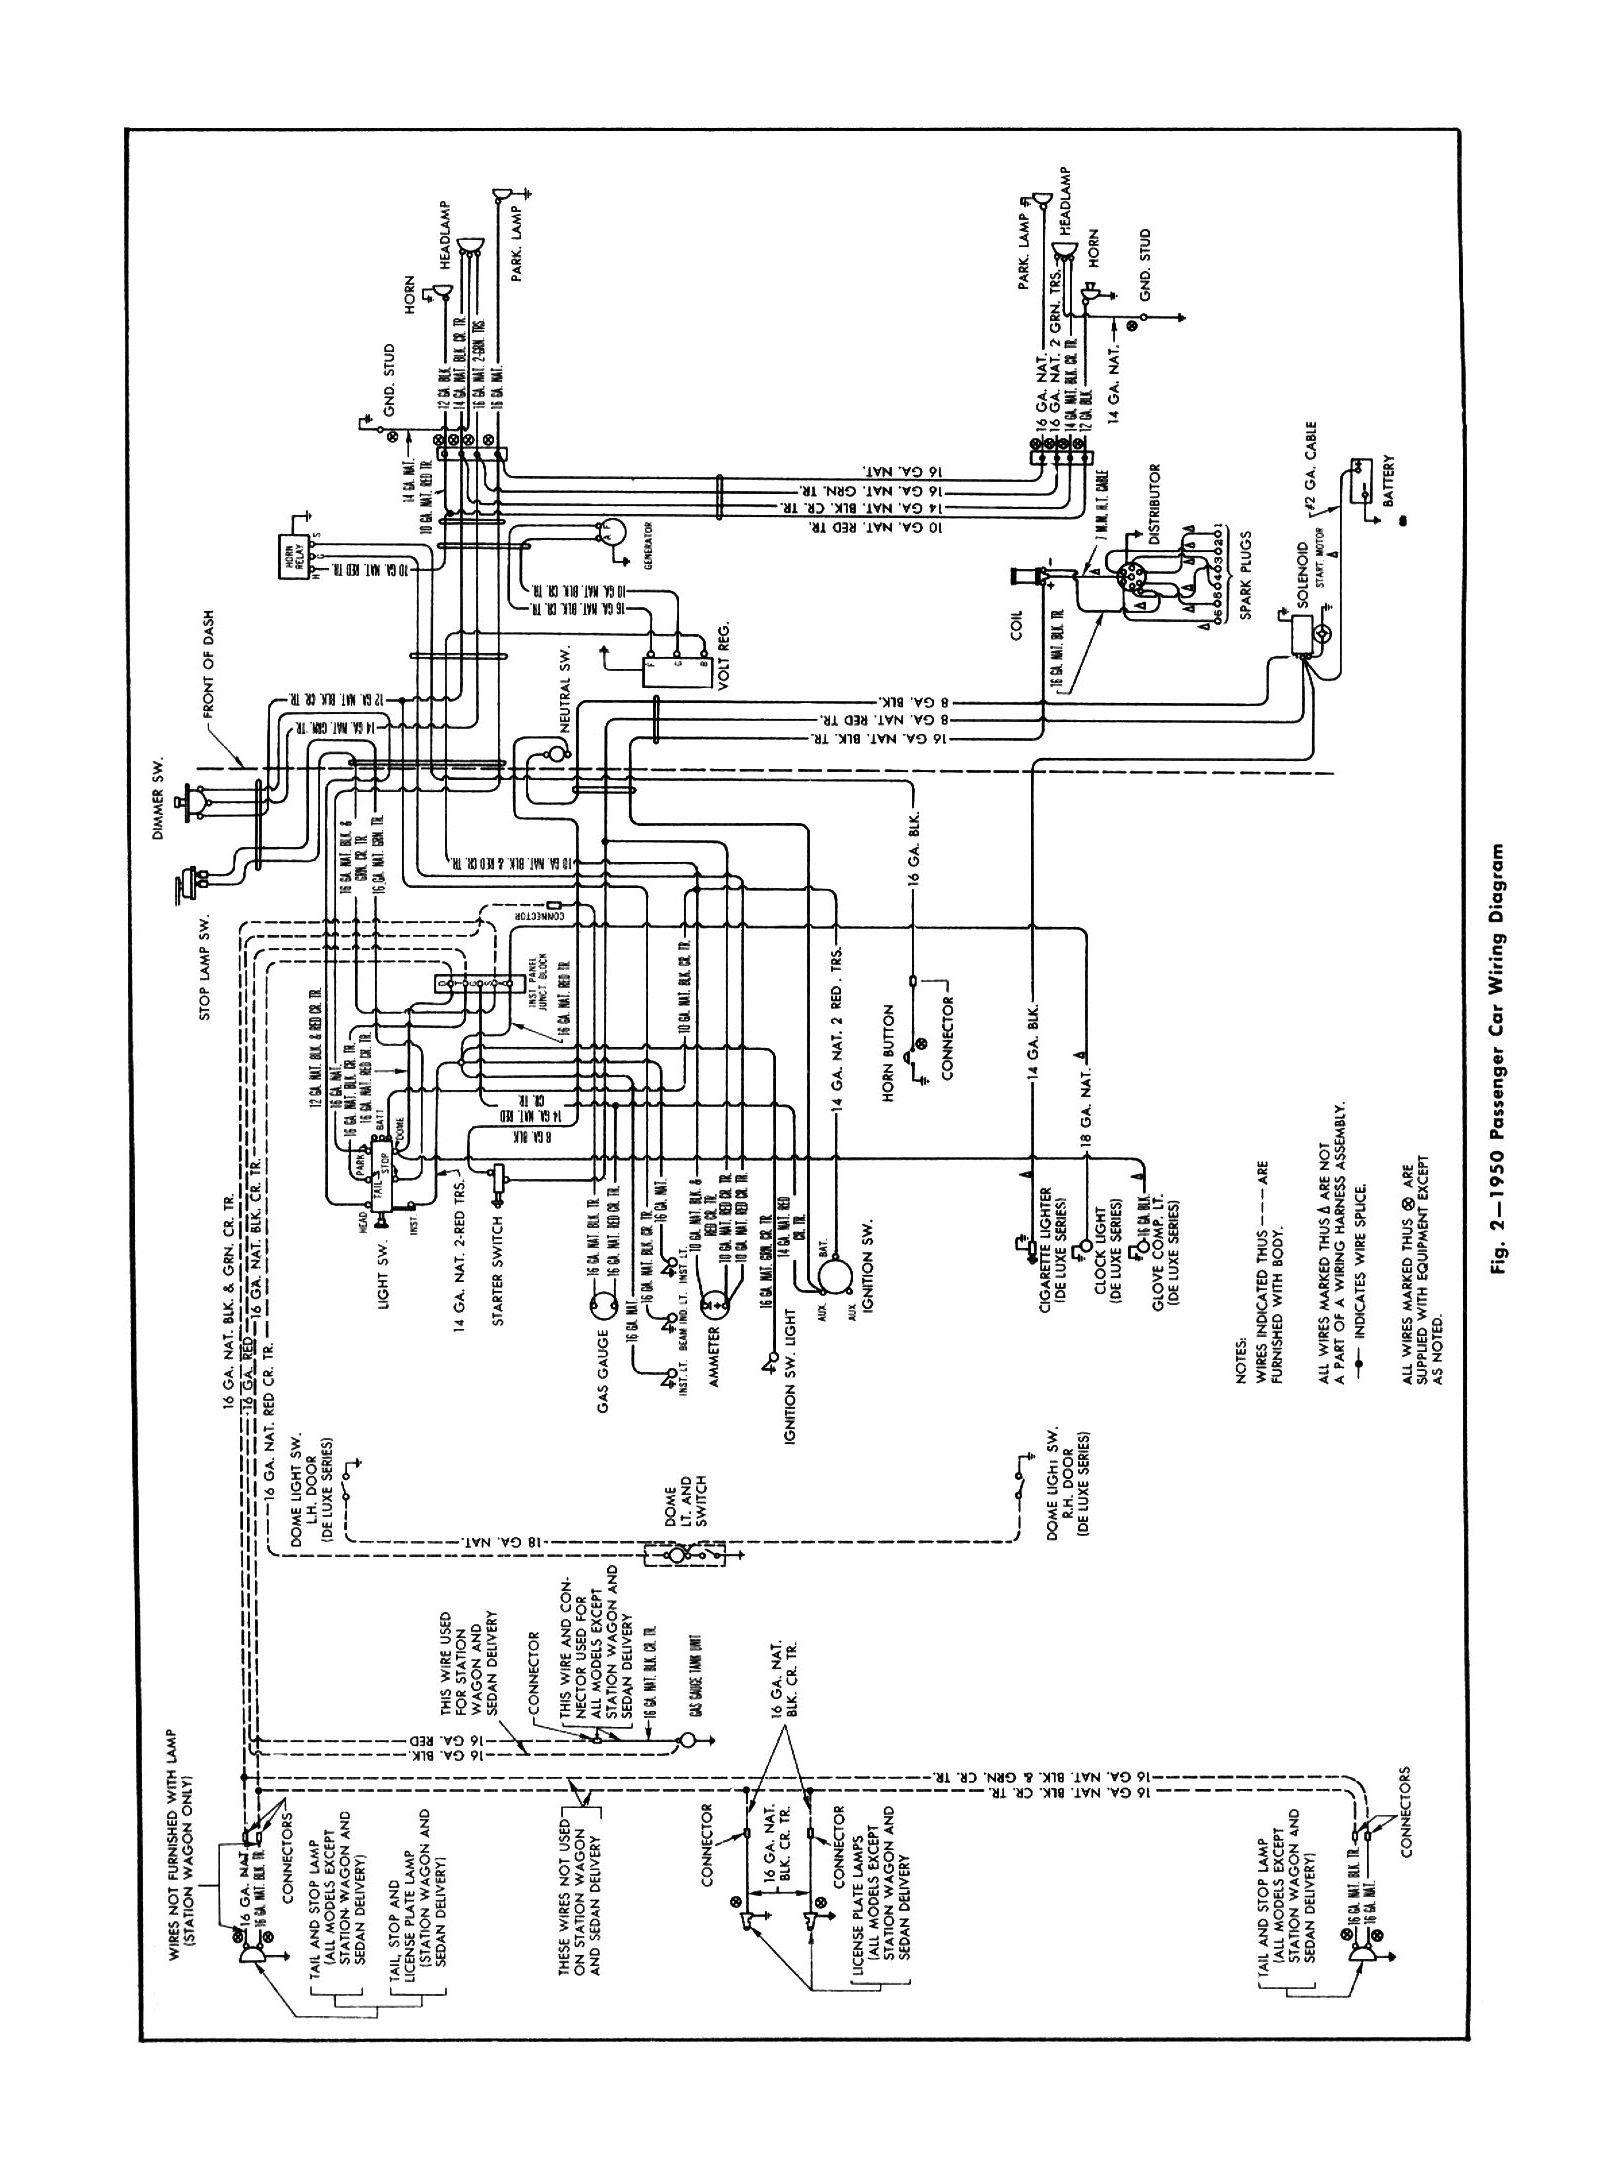 51 Studebaker Wiring Diagram Wiring Diagram Networks